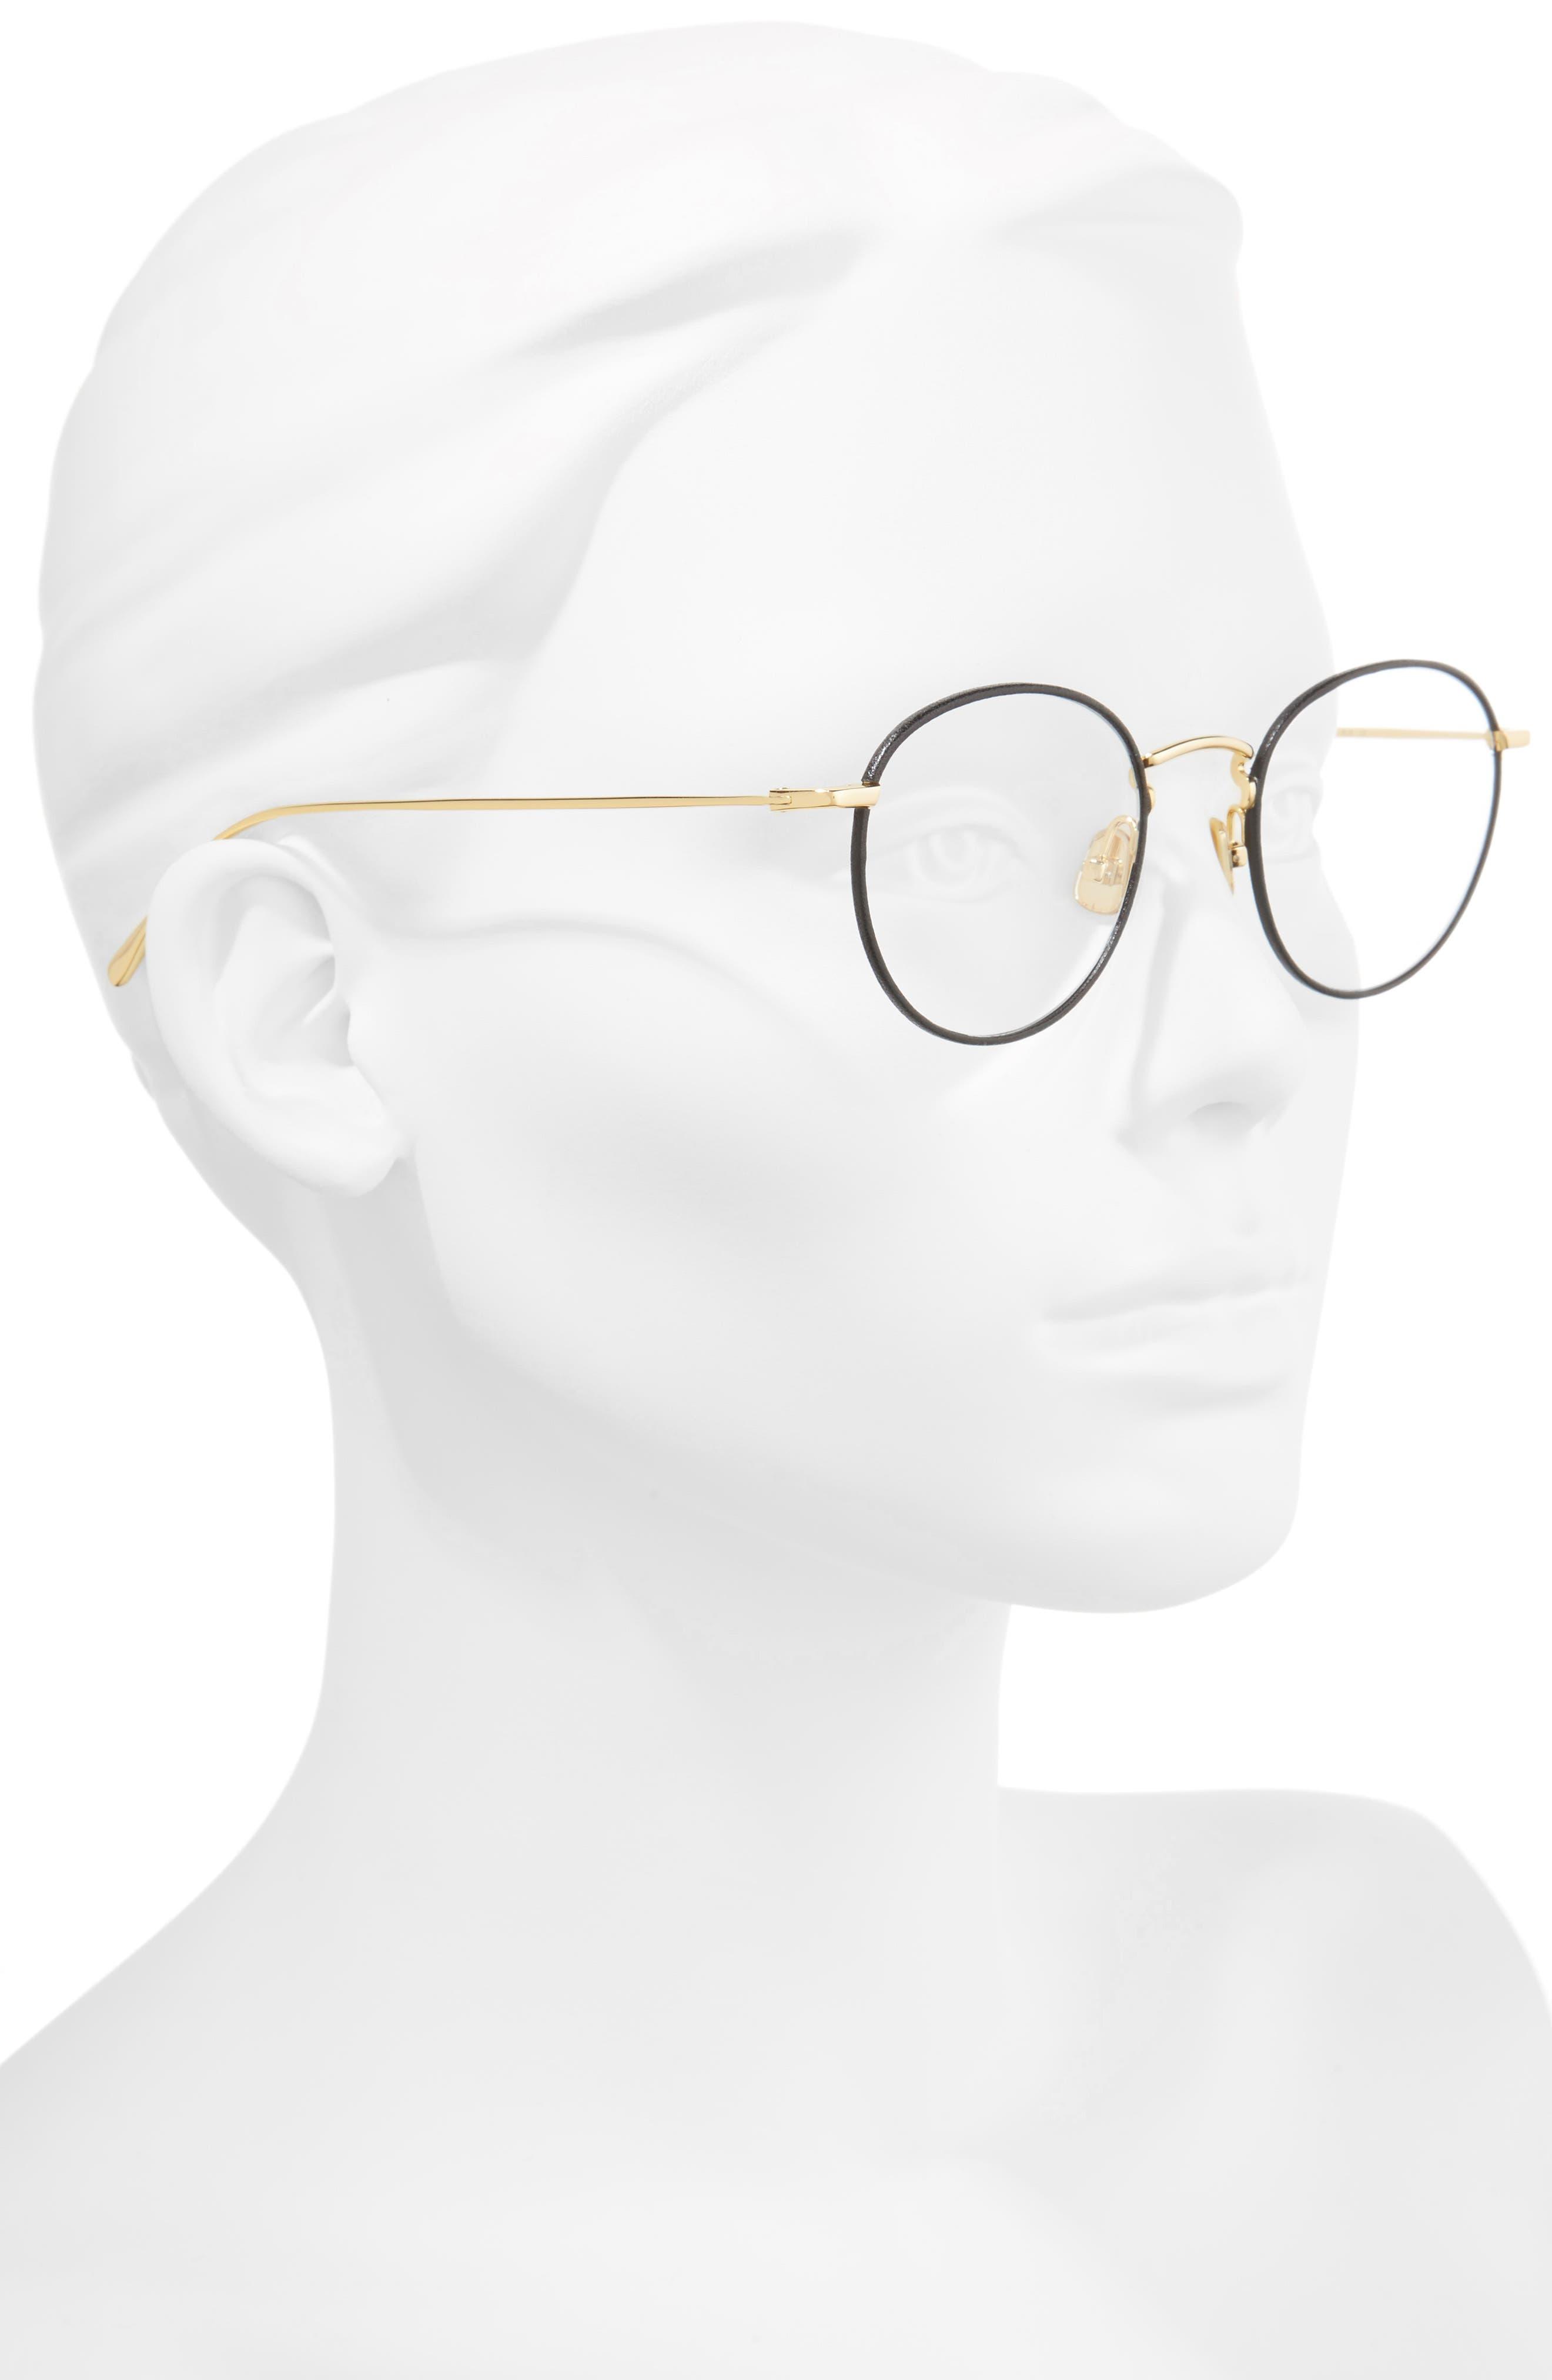 50mm Optical Glasses,                             Alternate thumbnail 2, color,                             BLACK